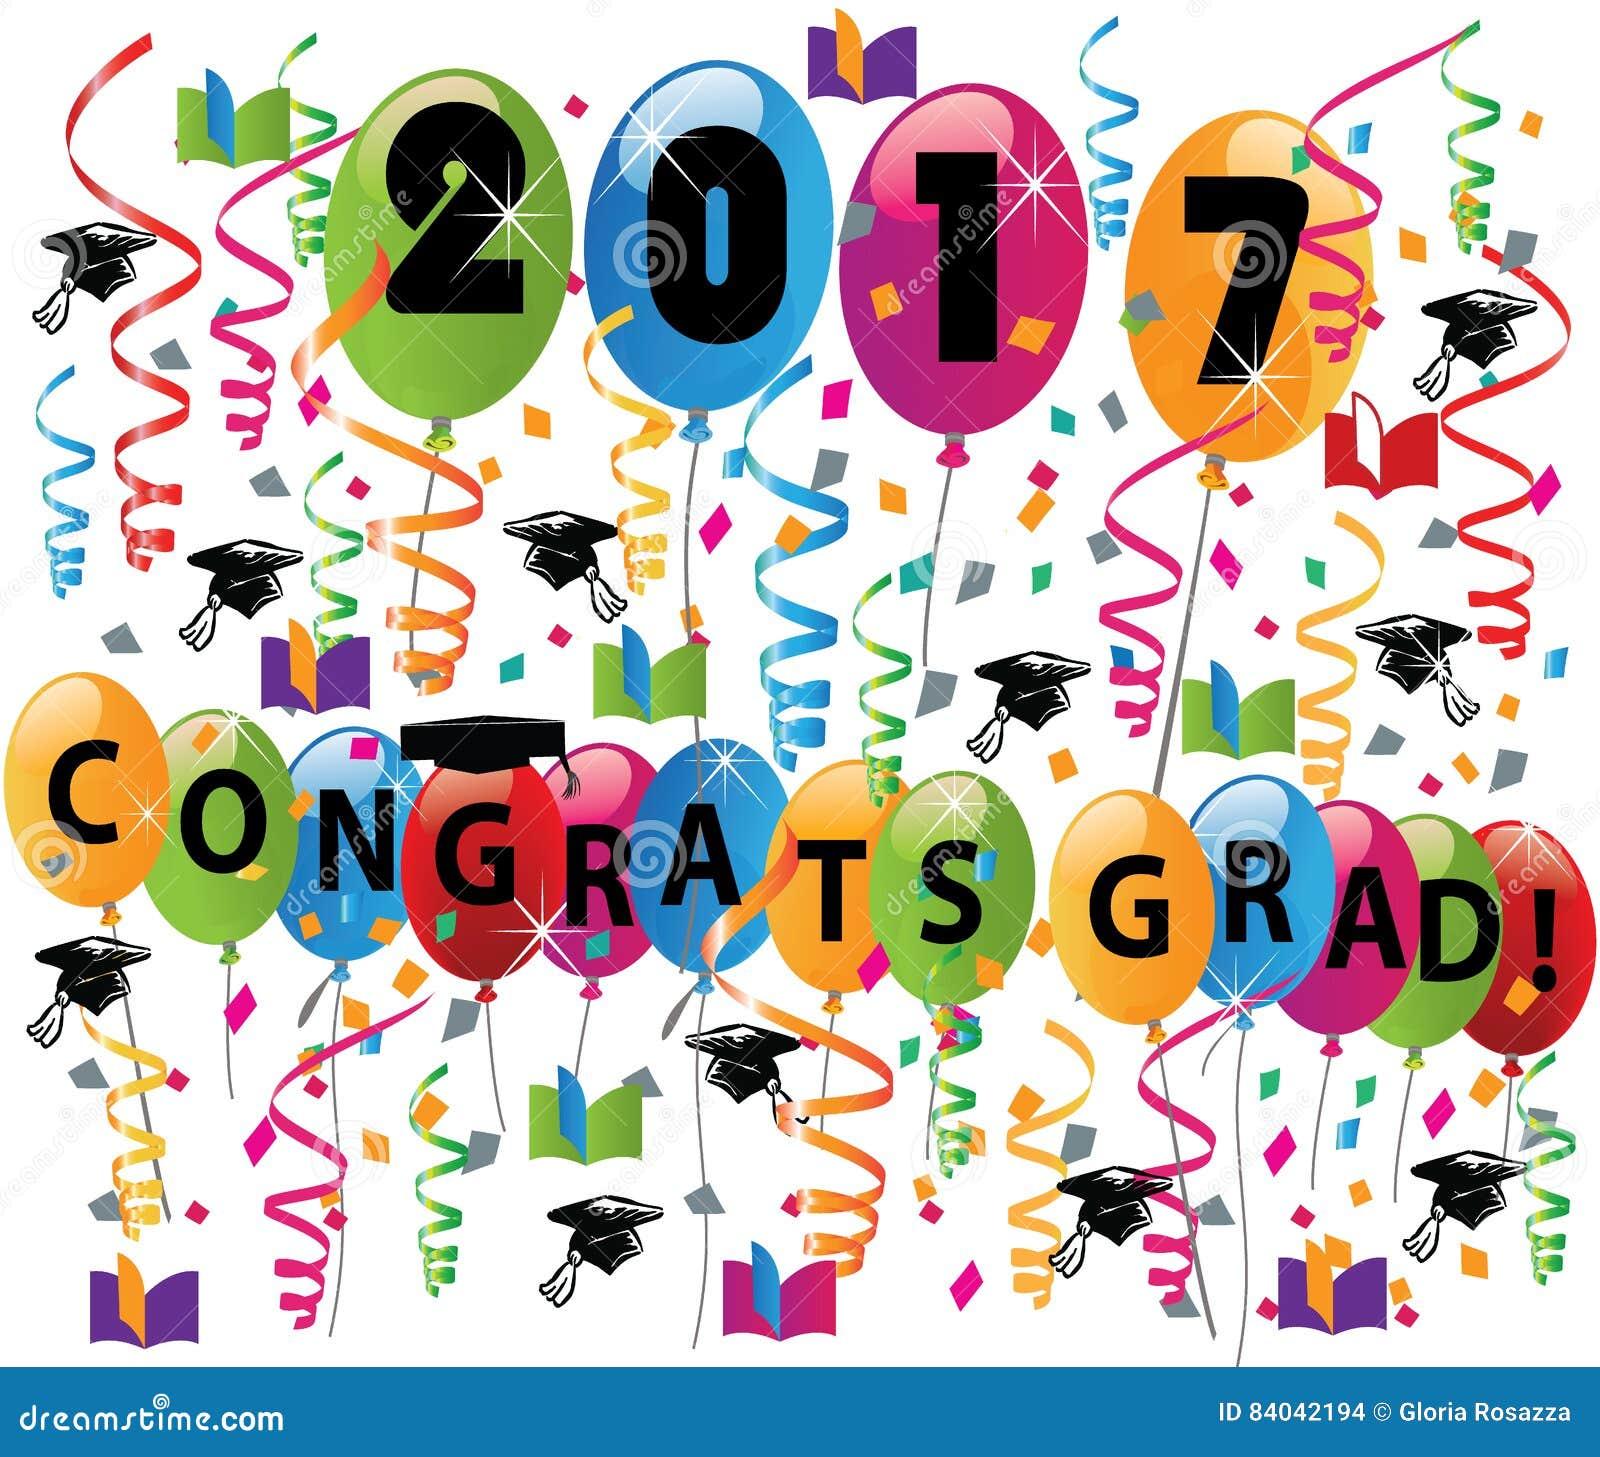 Graduation Card Congratulation Celebration Stock Vector